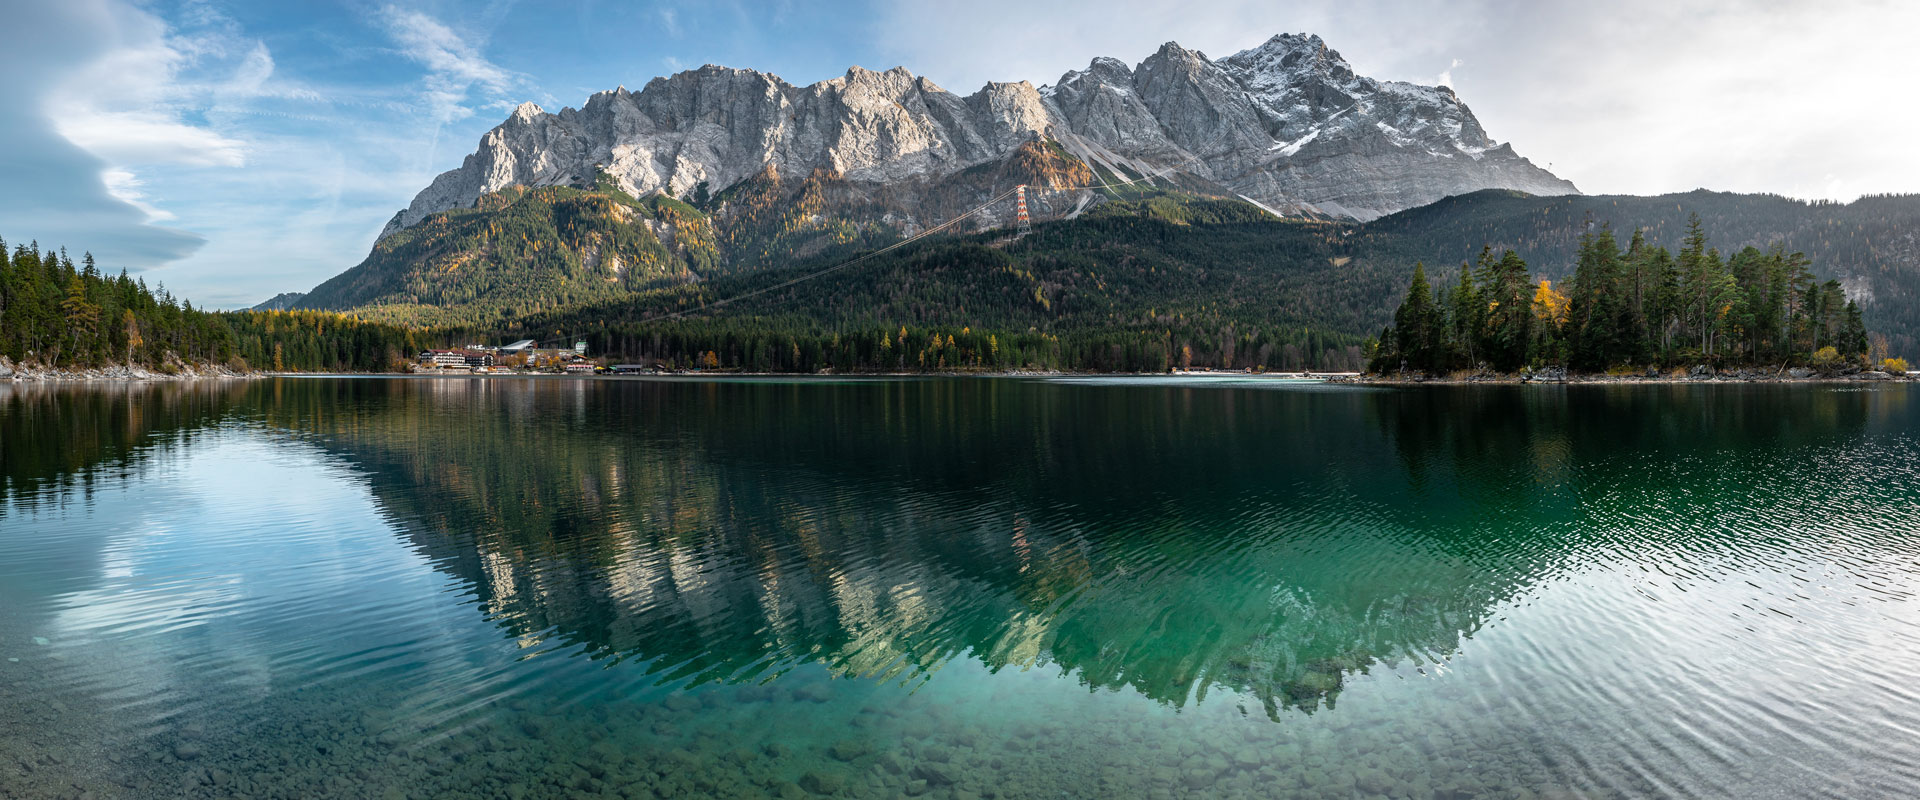 Alperne: Rundvandring om Zugspitze